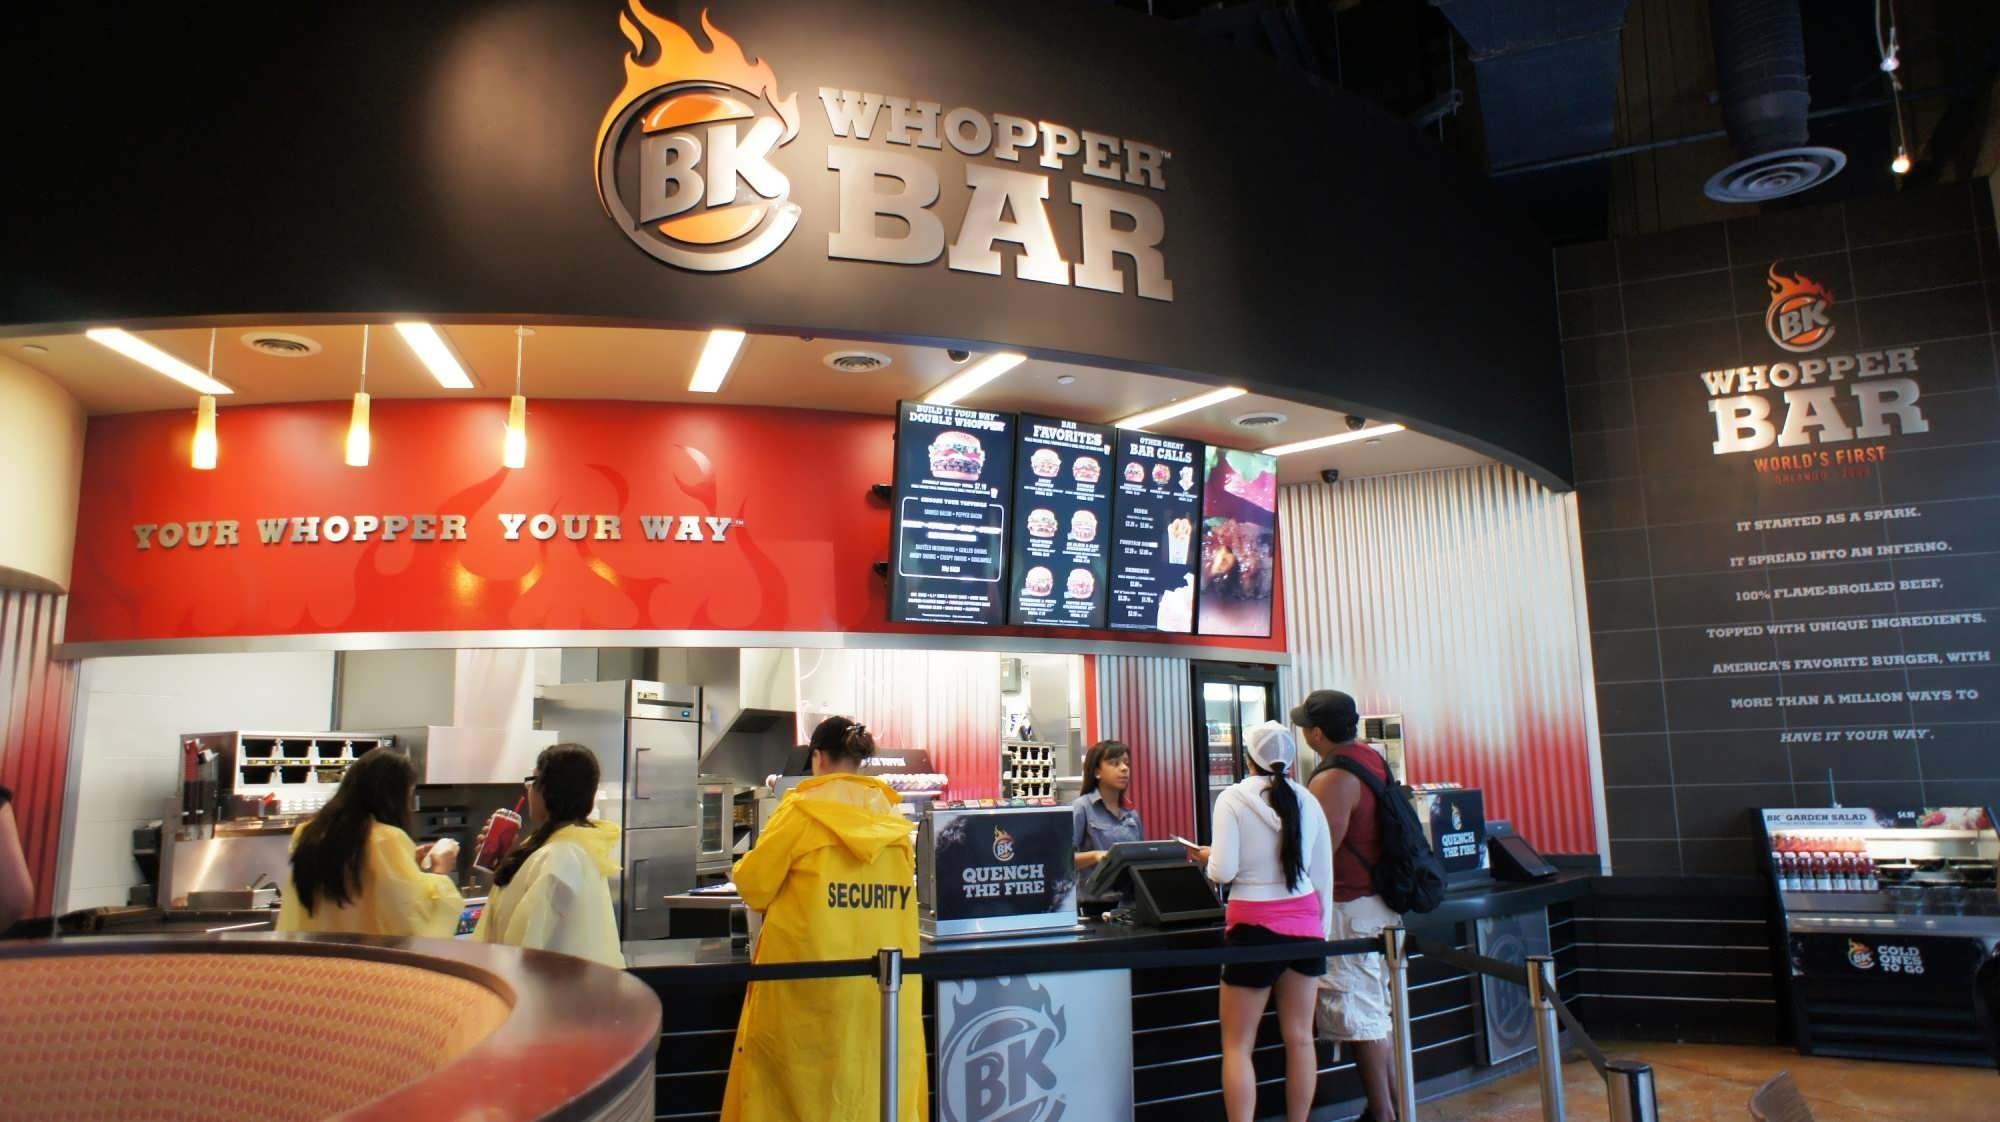 The world's first Burger King Whopper Bar